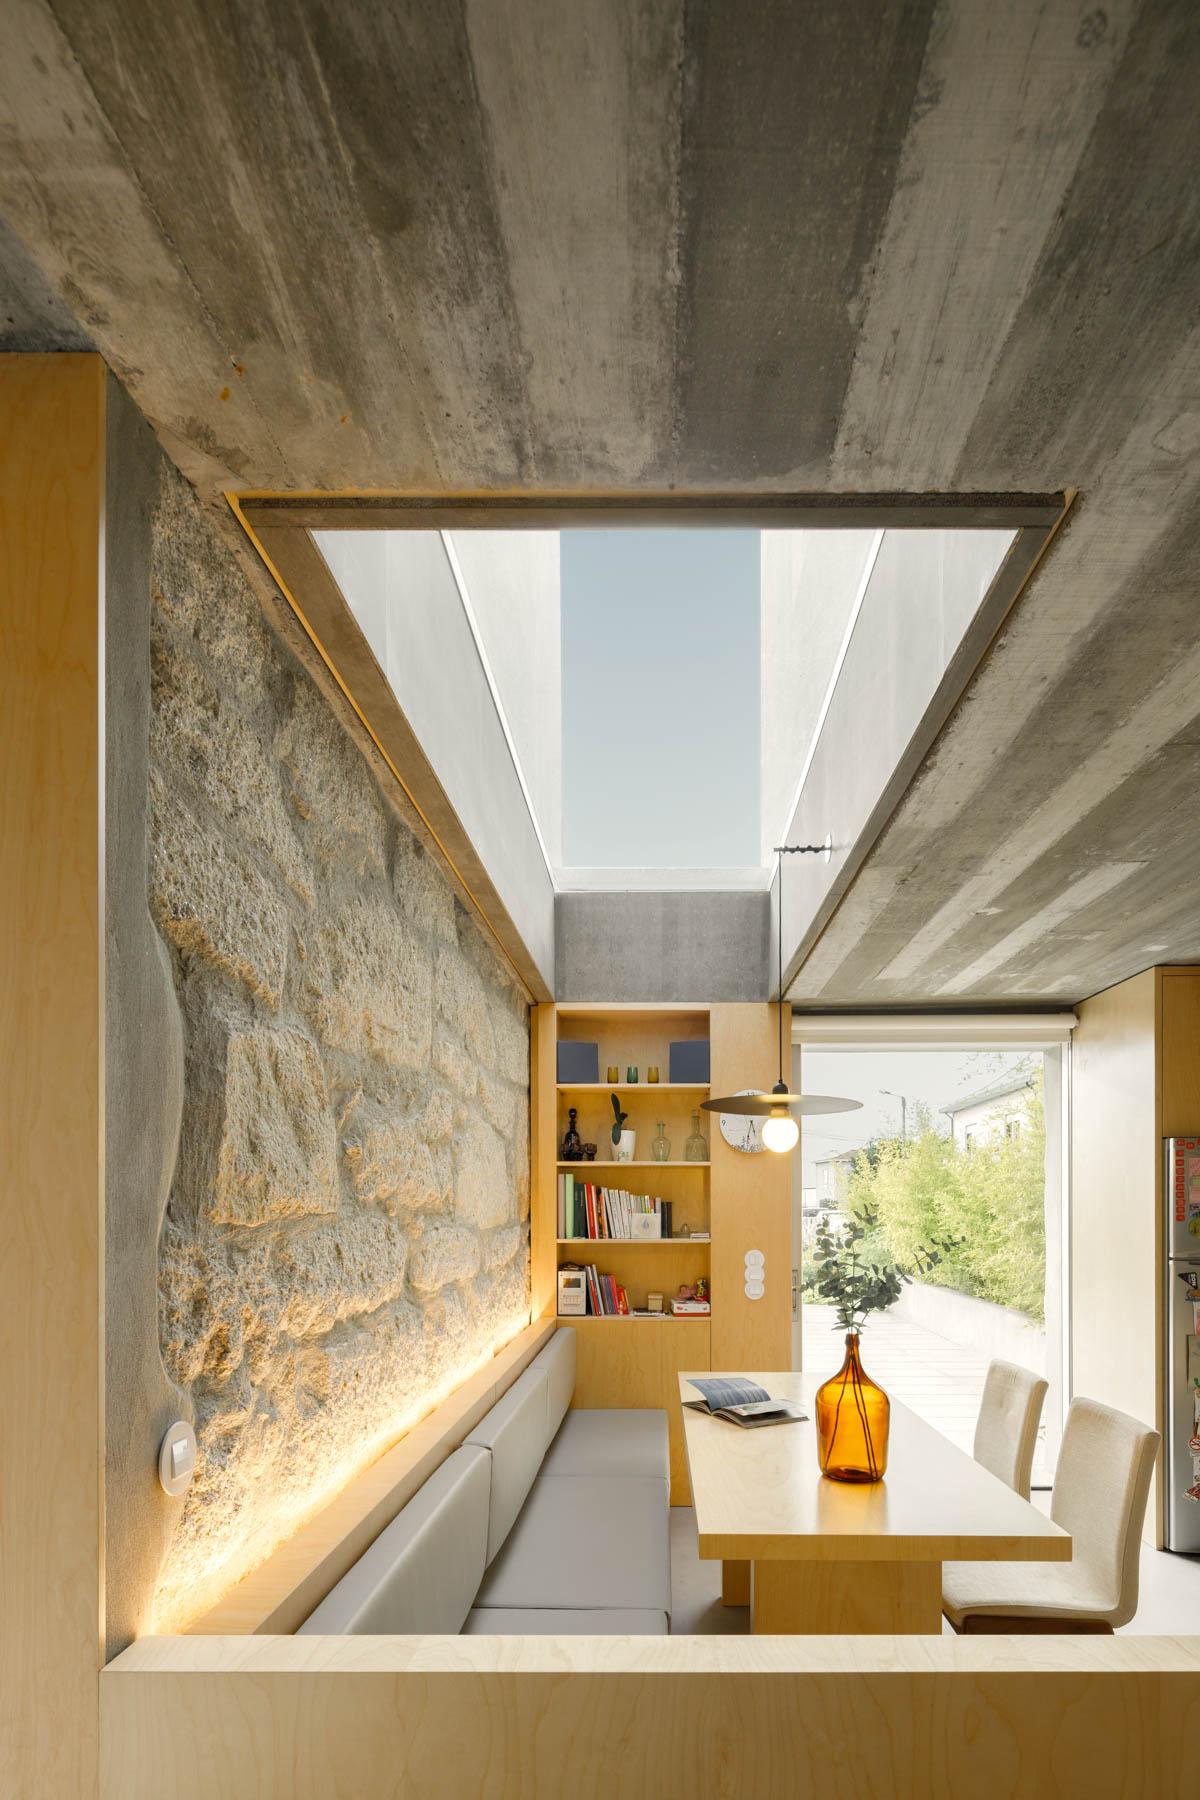 Casa Rio em Paredes do Atelier de Arquitectura Paulo Merlini Arc